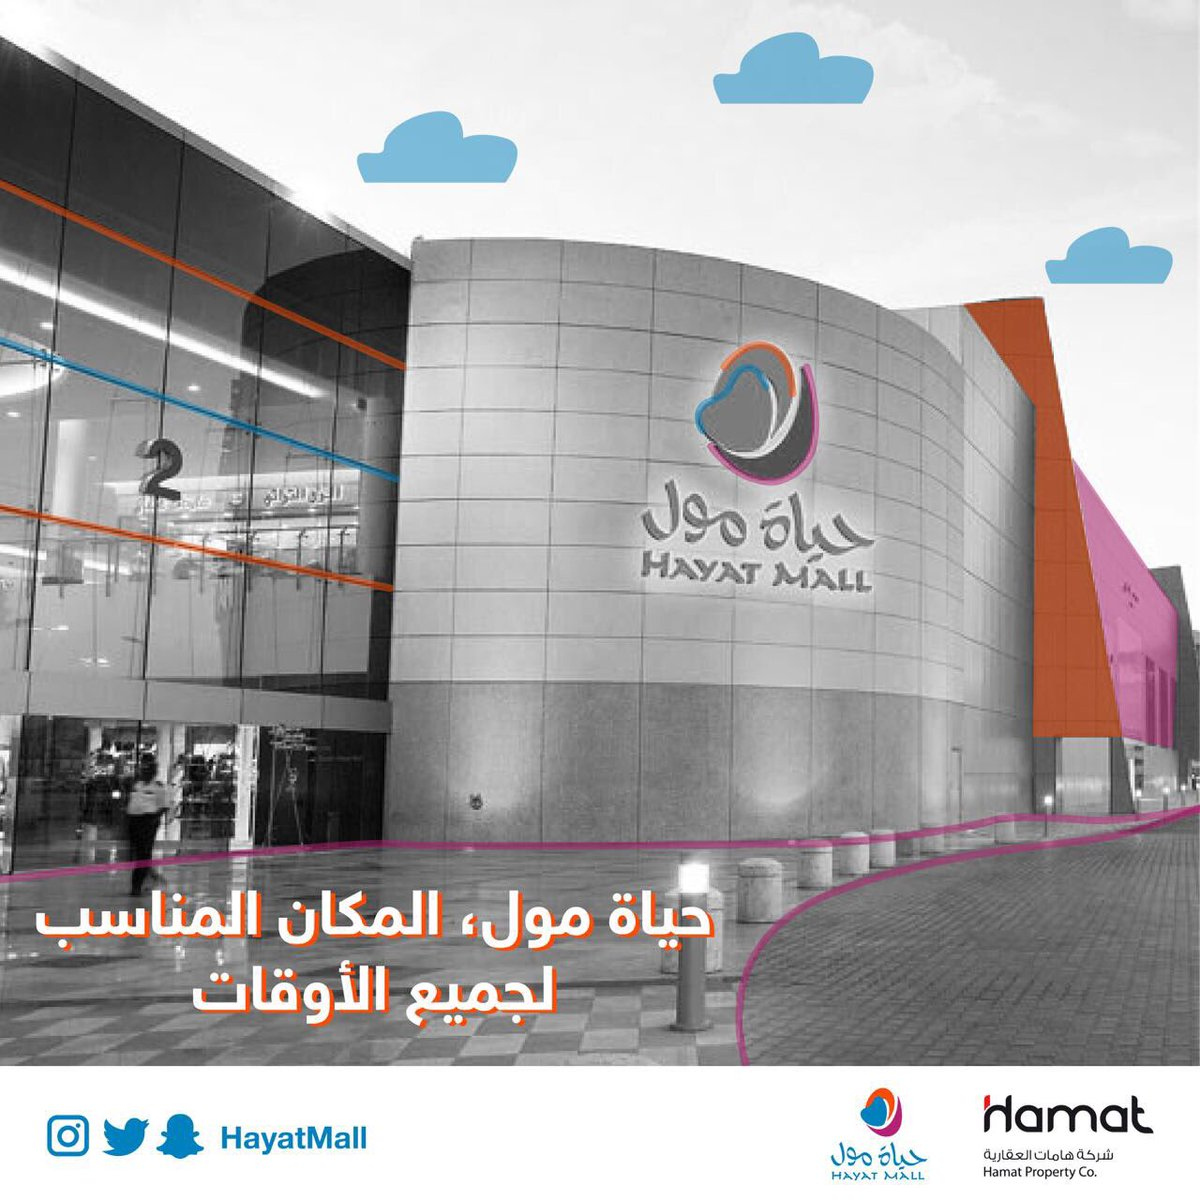 7093041aa حياة مول Hayat Mall on Twitter: